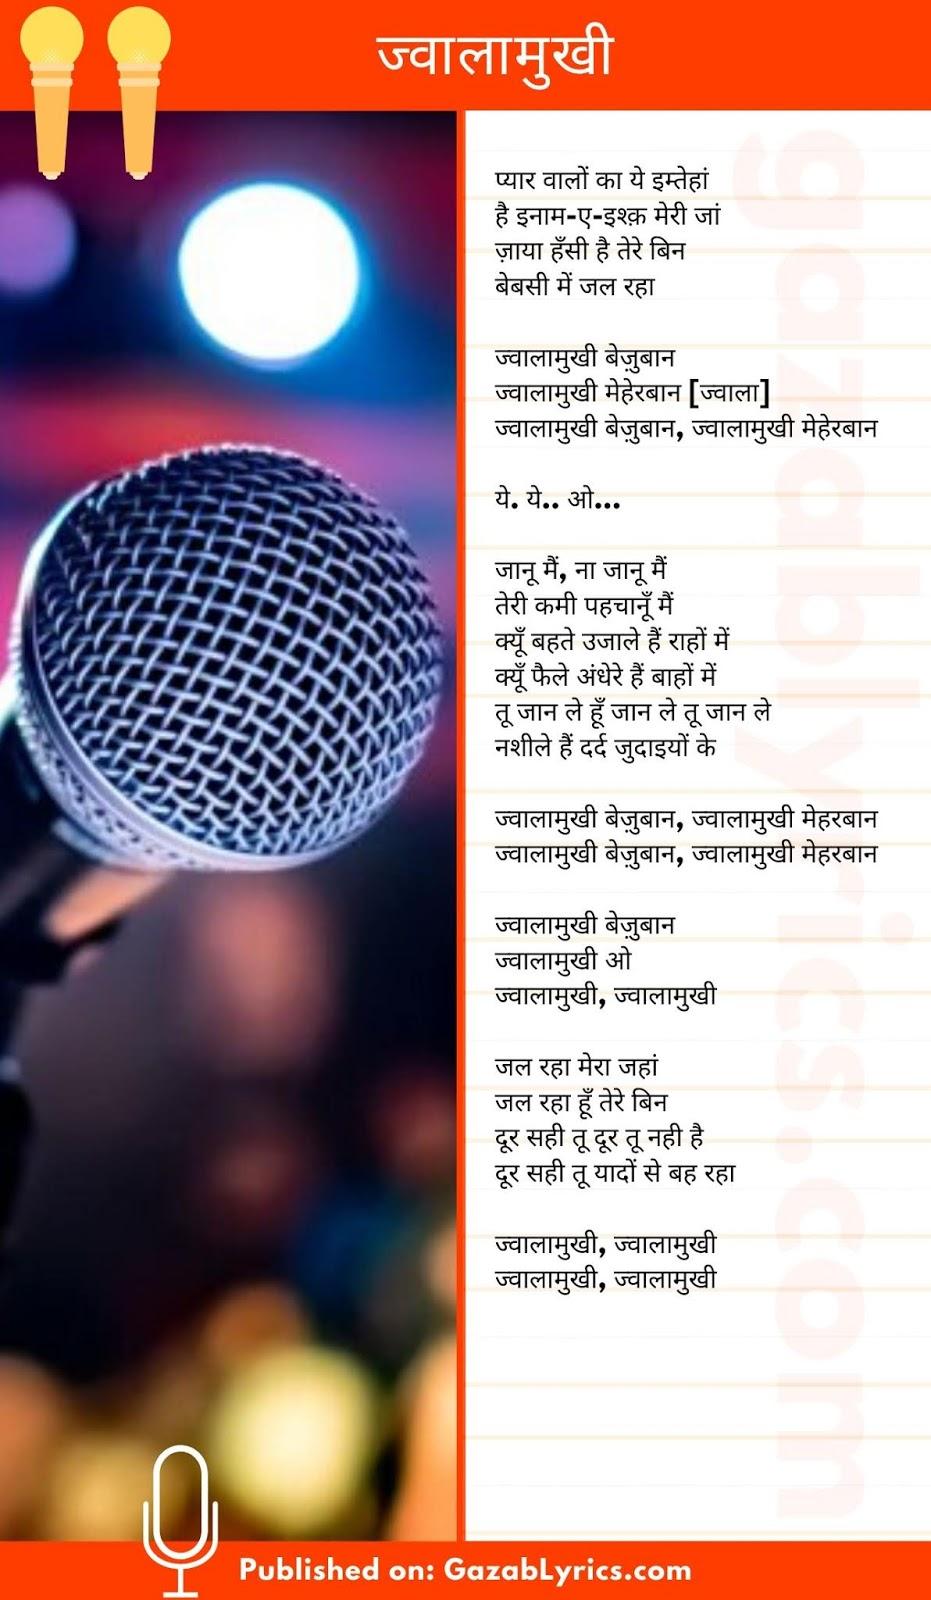 Jwalamukhi lyrics in Hindi